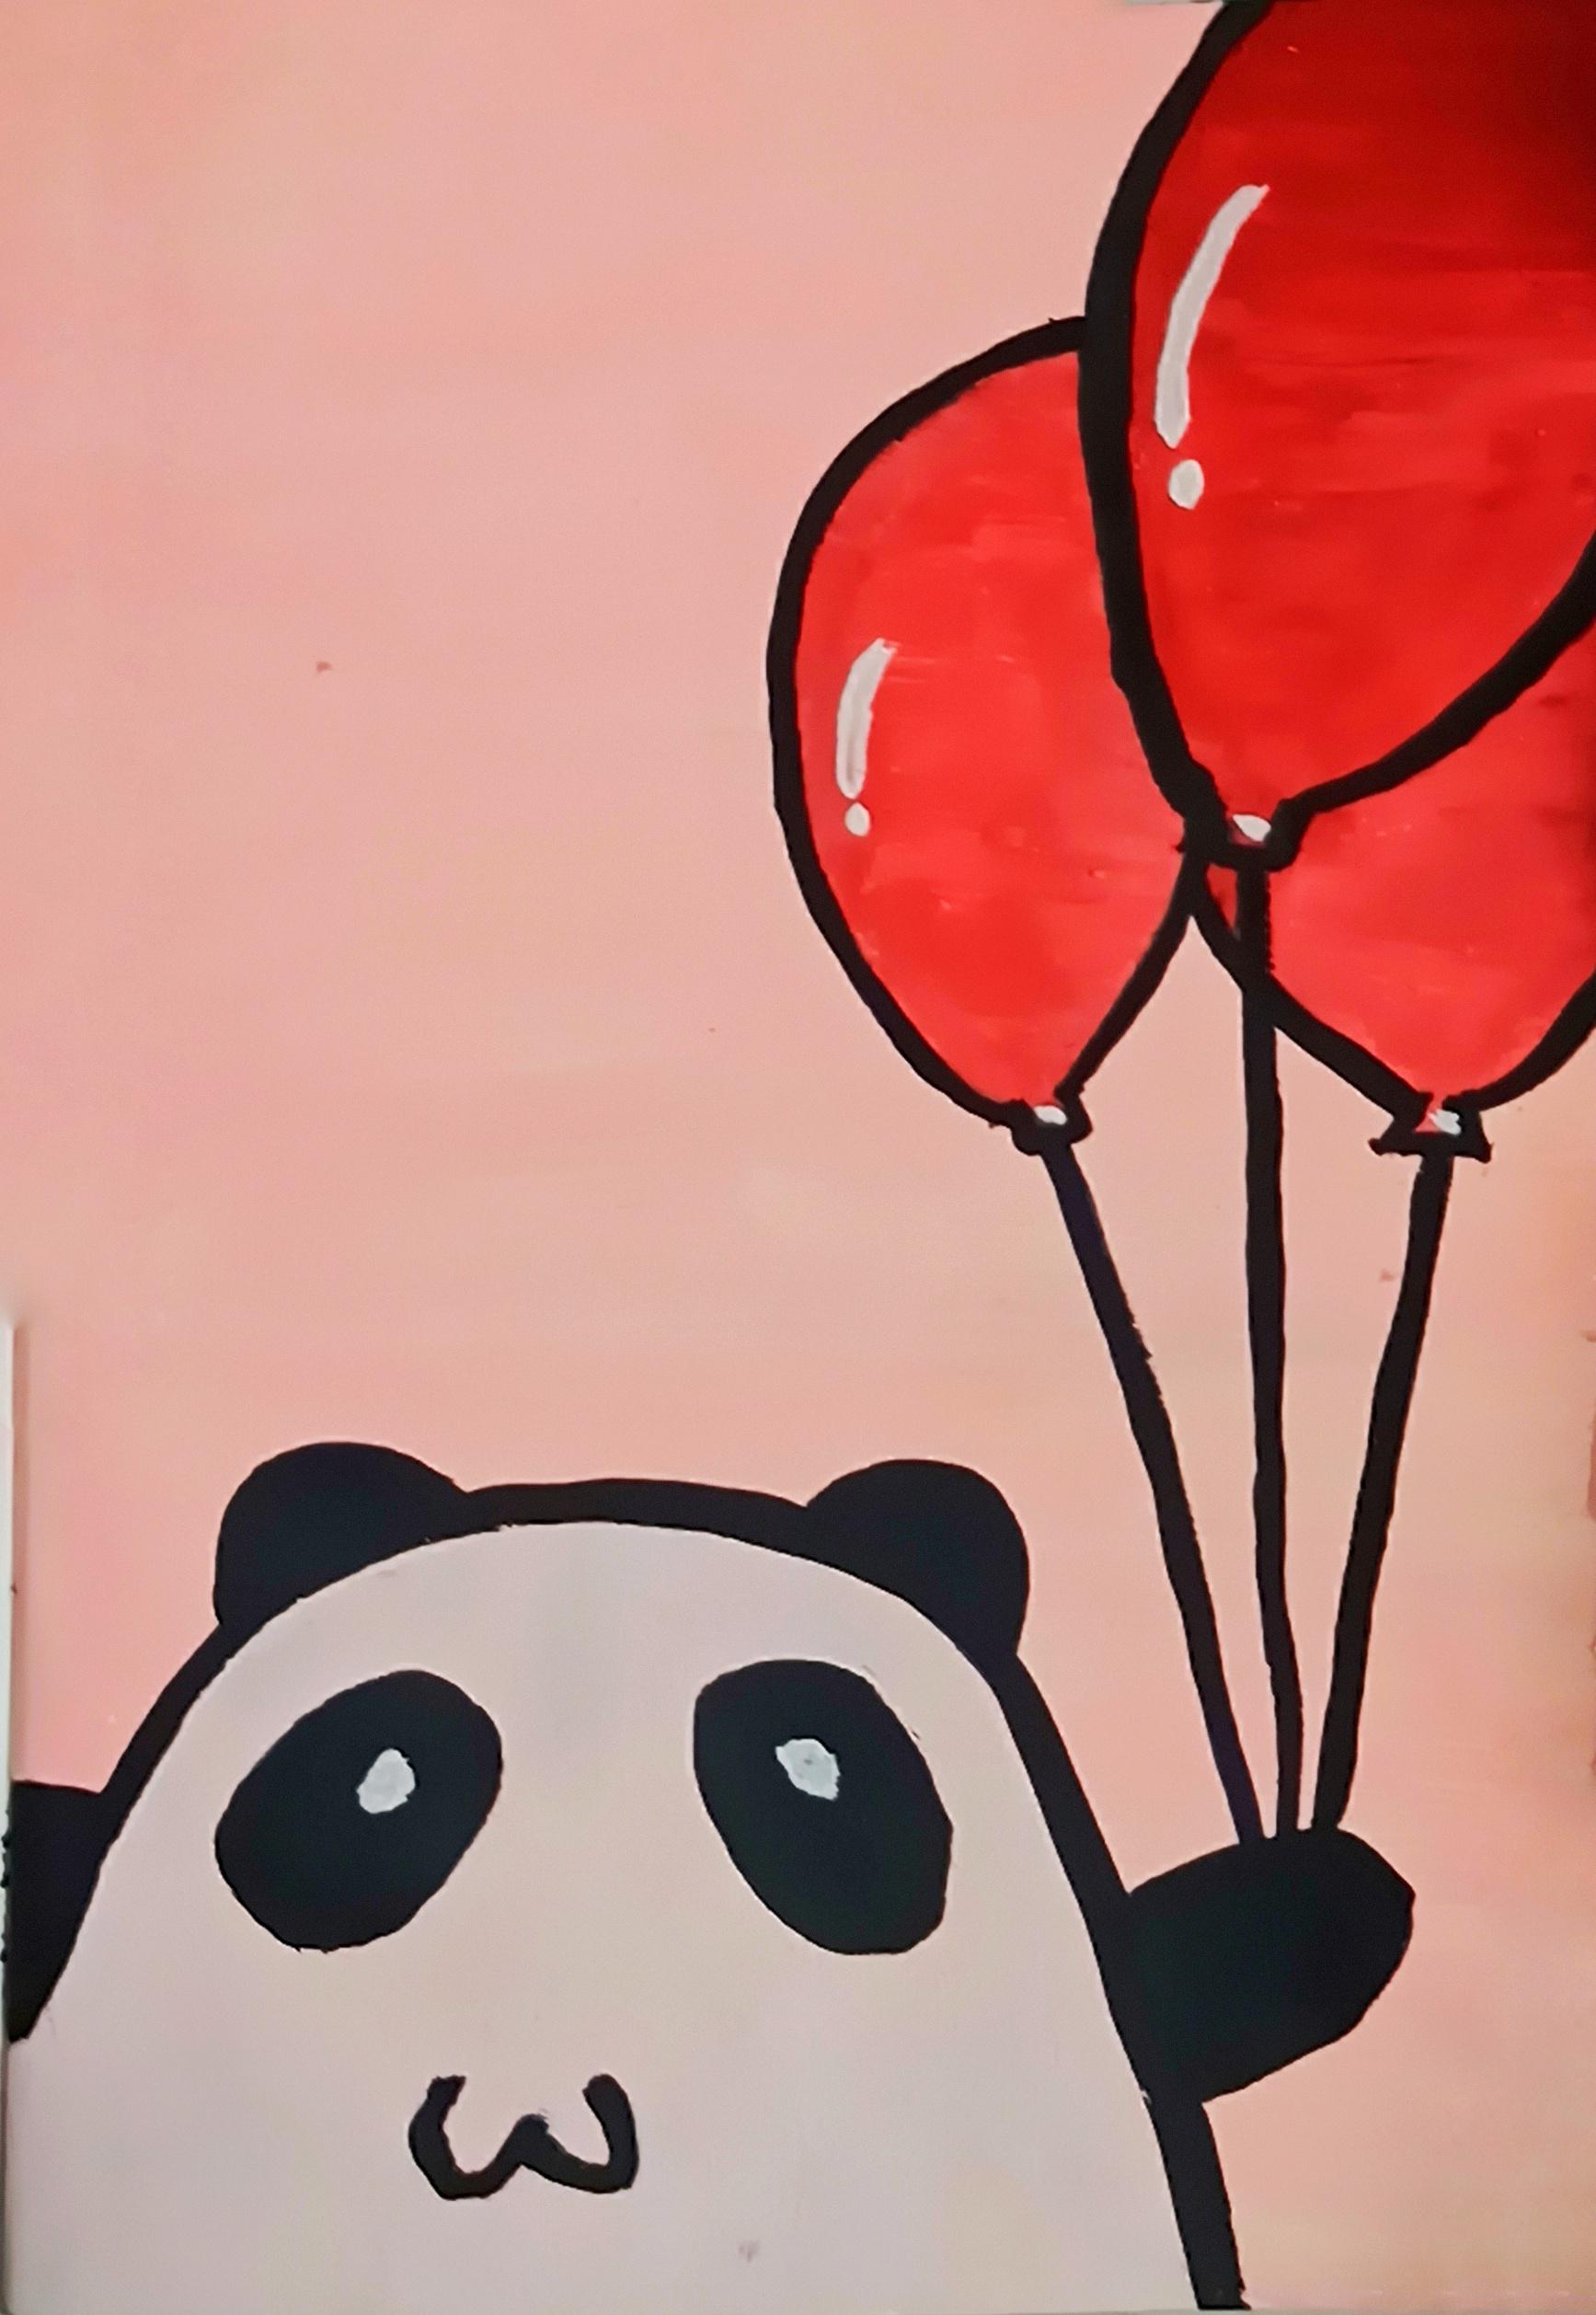 Happy panda drawing